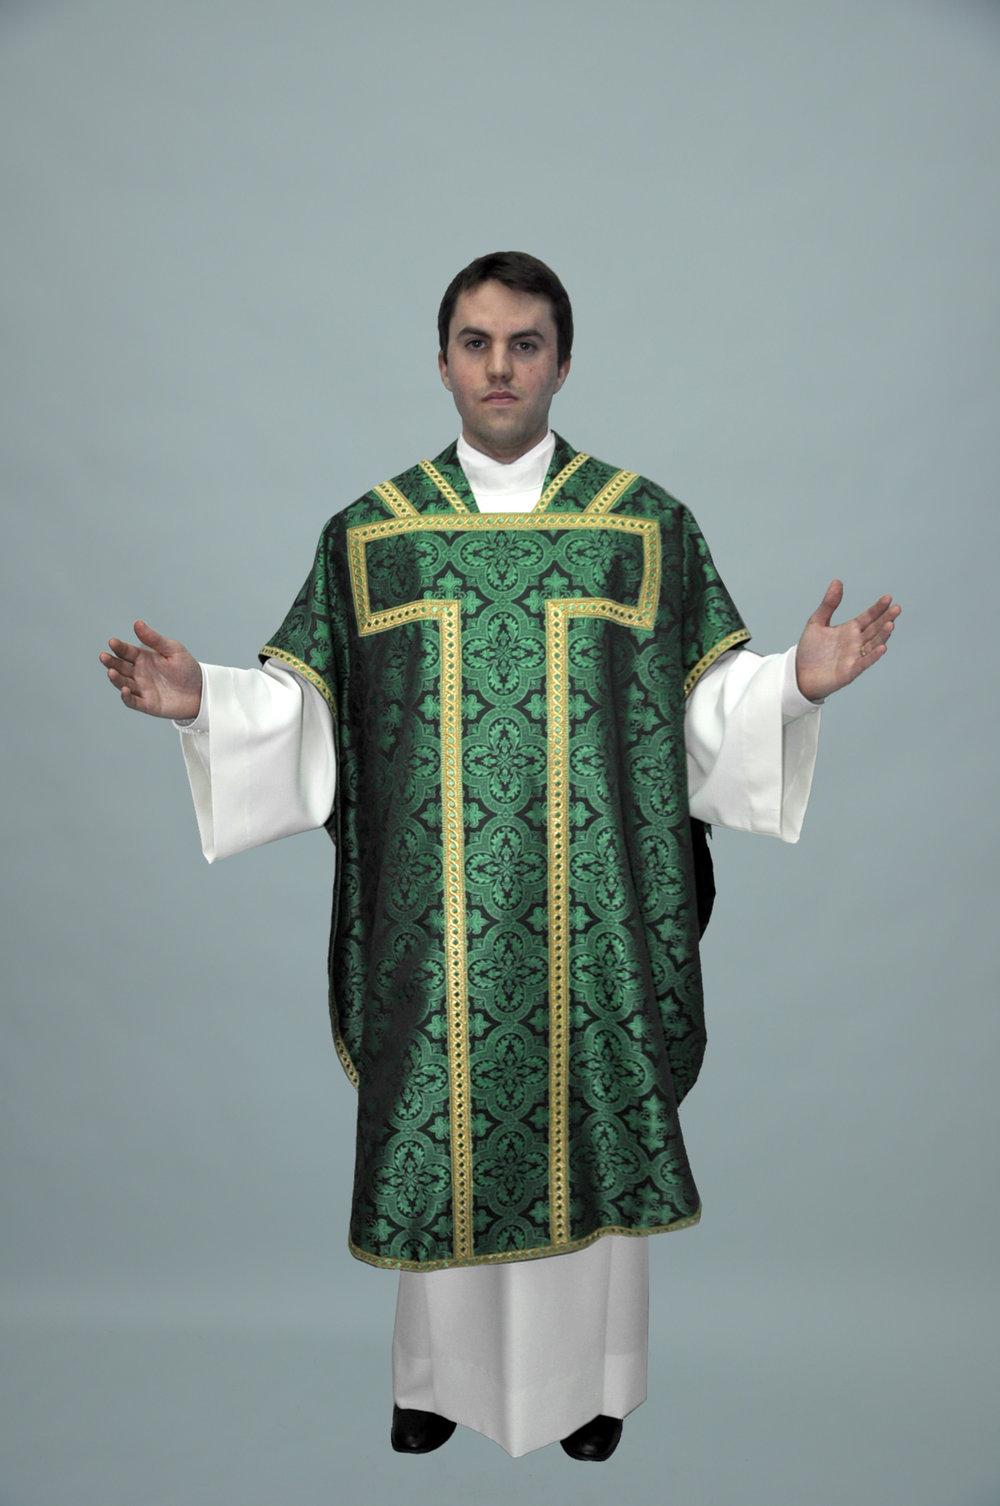 St Philip Neri Davinci Green W 2326 Green gold (f) 2.jpg